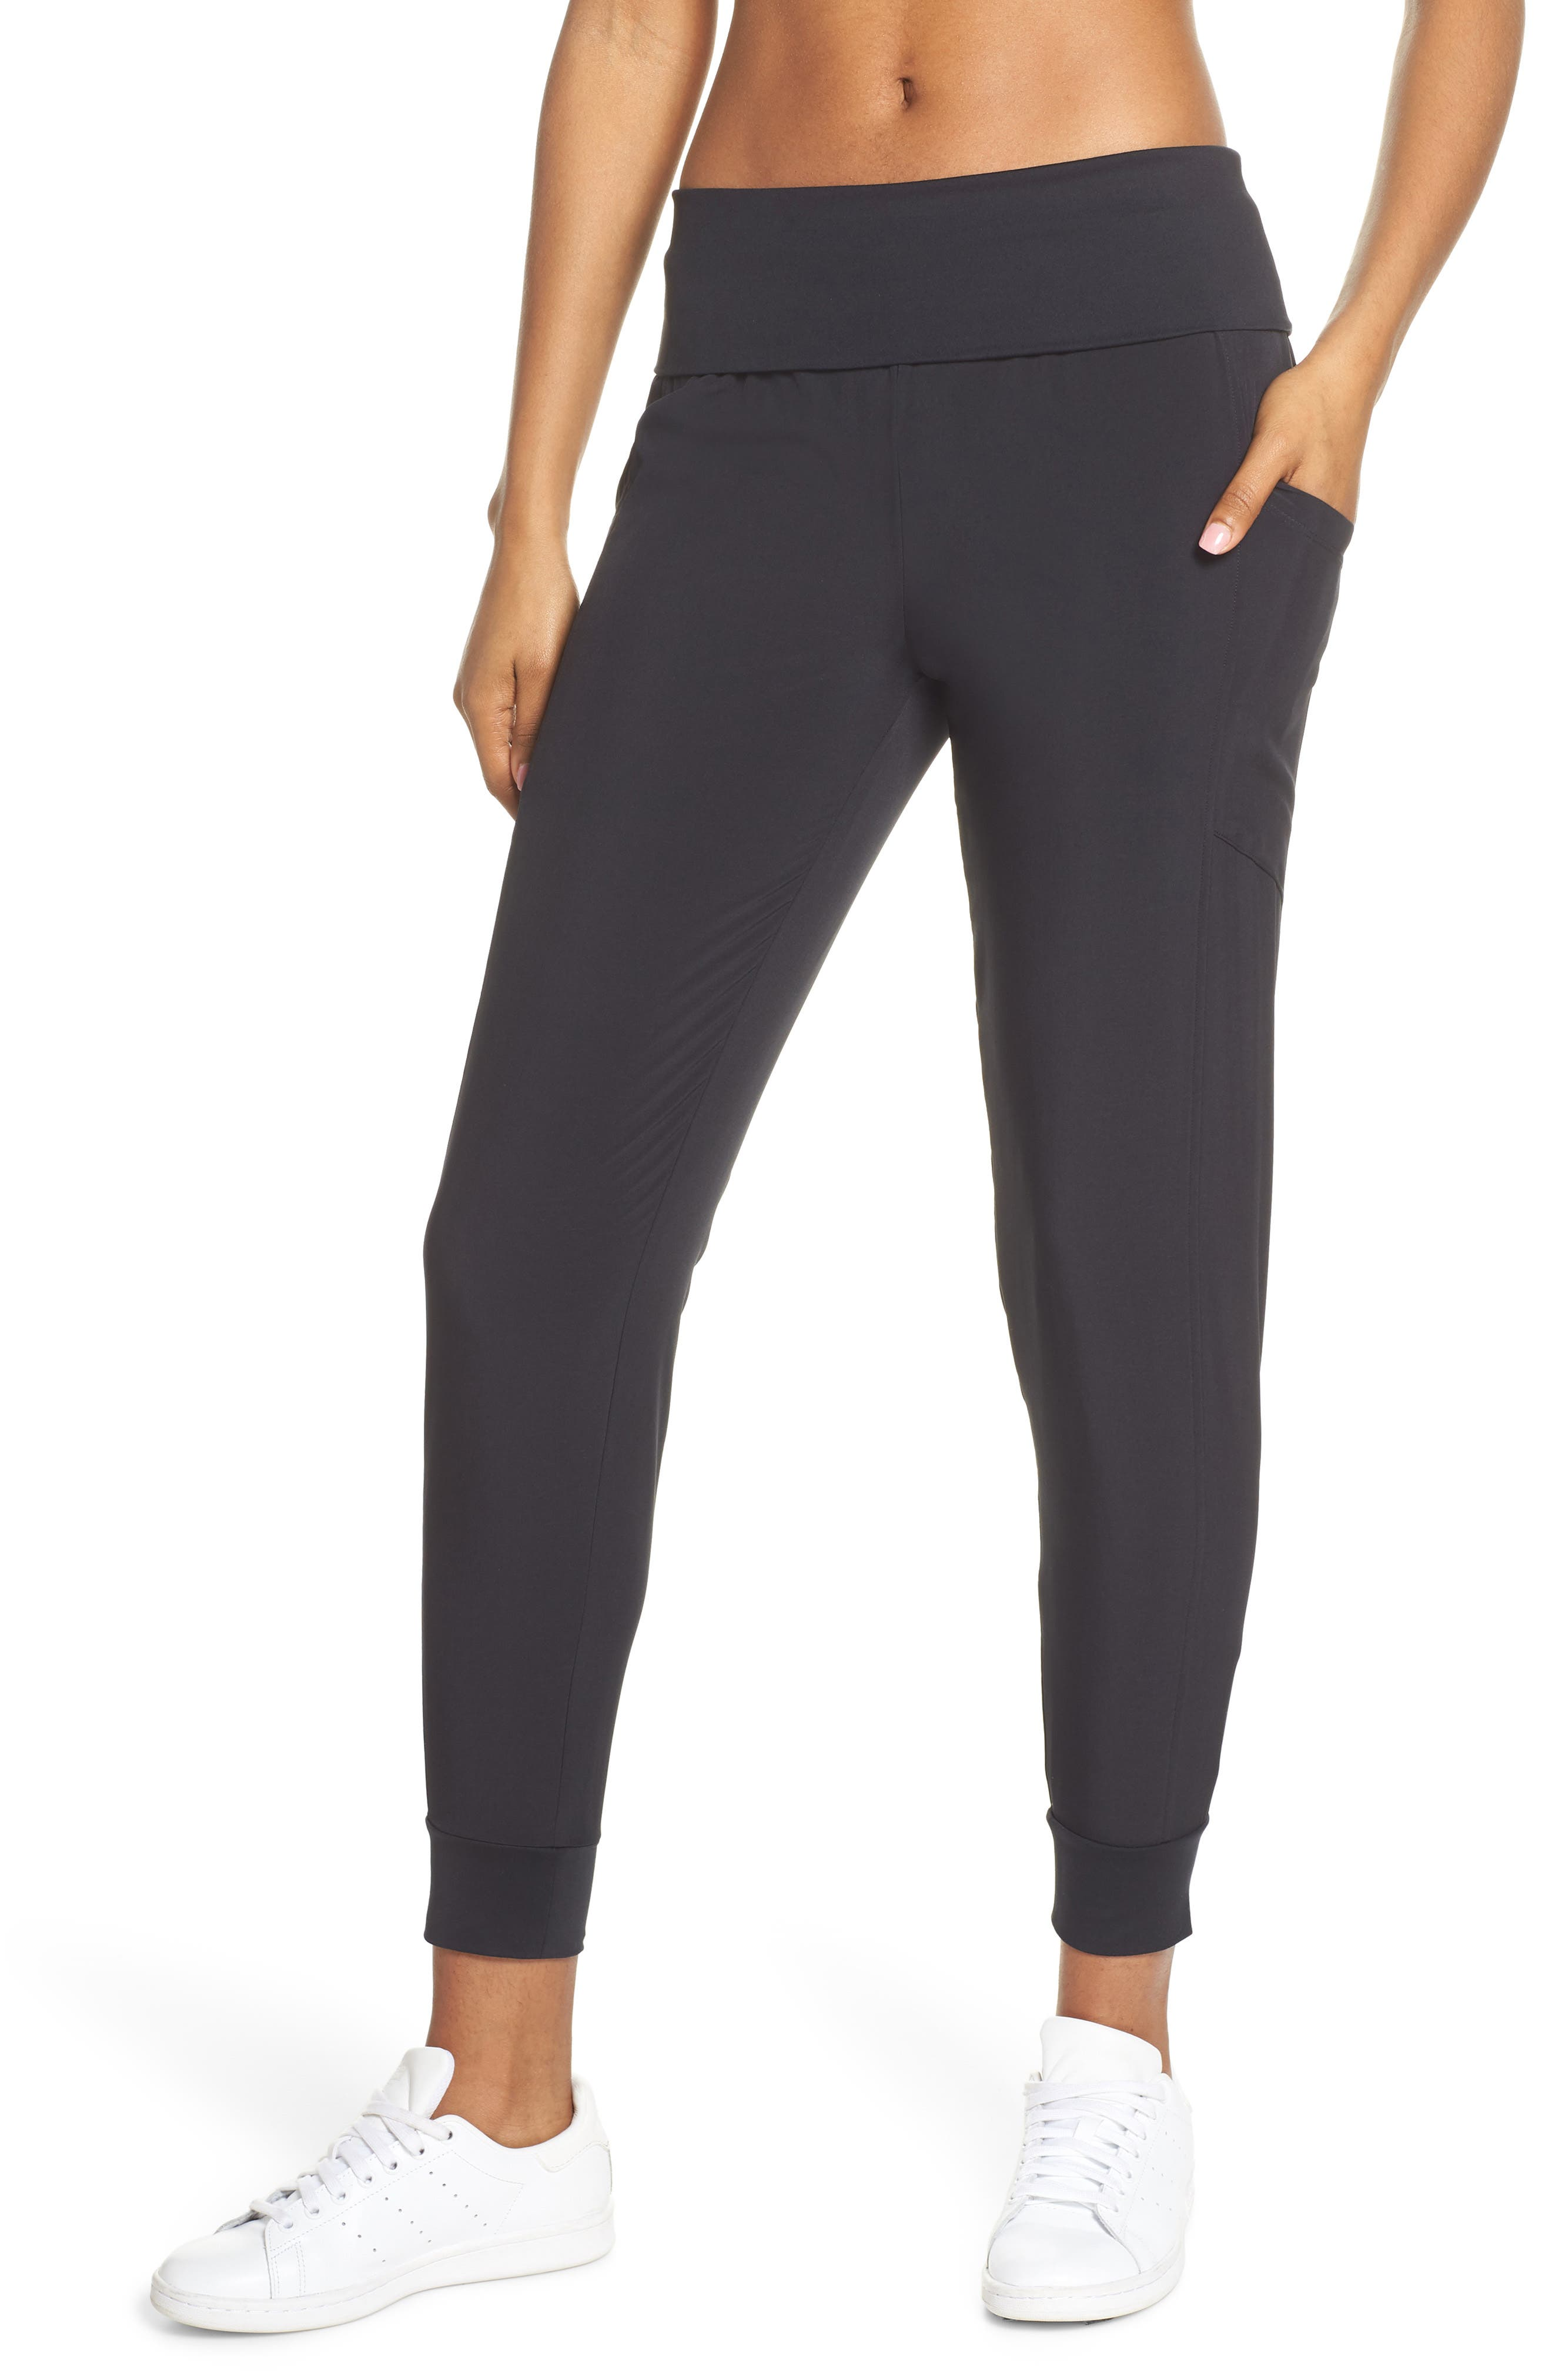 ZELLA, Urban Fold Down Waist Ankle Pants, Main thumbnail 1, color, BLACK